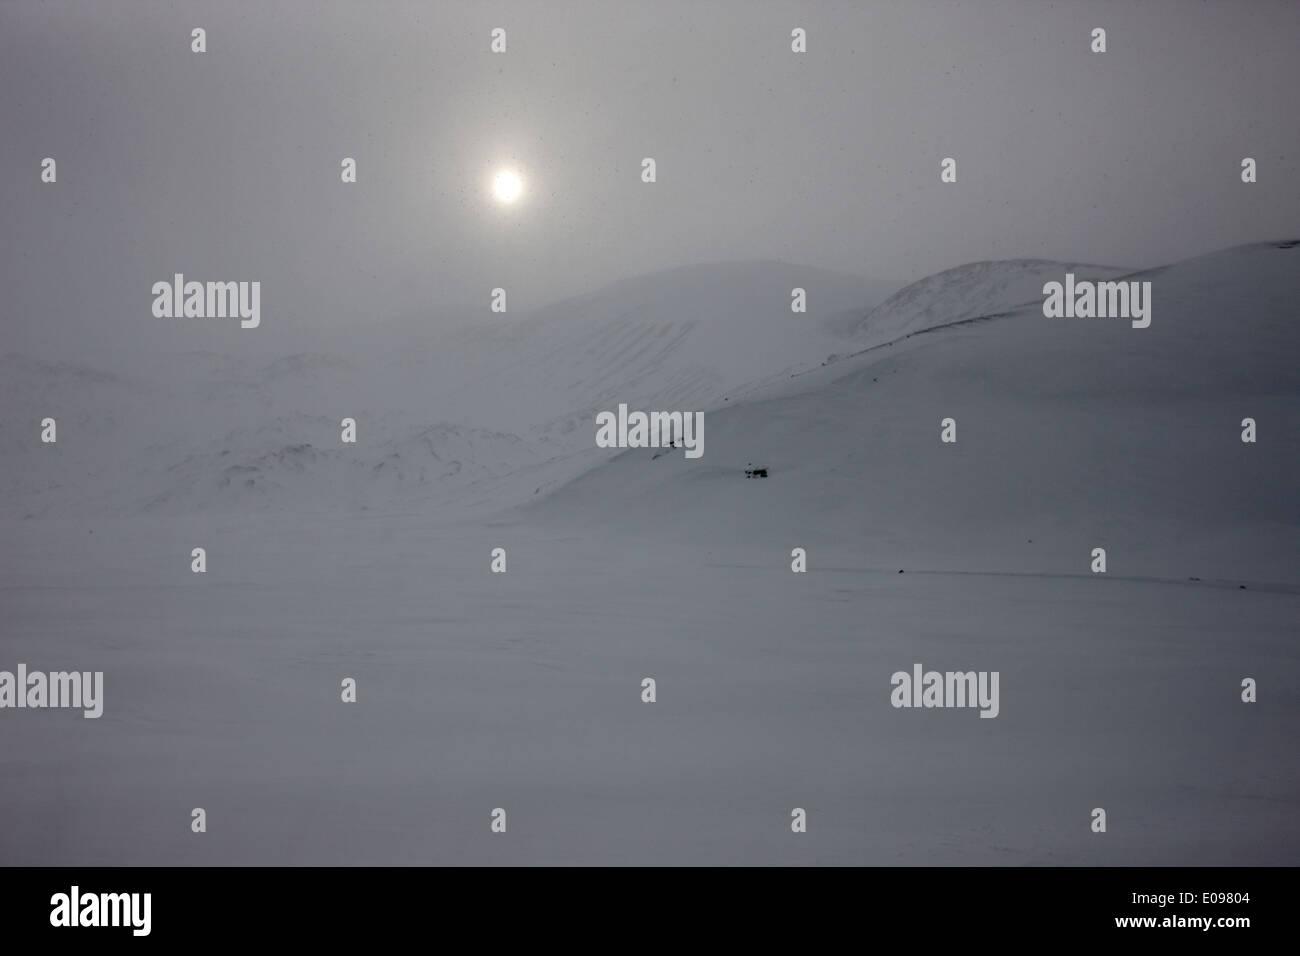 Sonne, weiße out Schneesturm Whalers Bucht Täuschung Insel Antarktis durchbrechen Stockbild